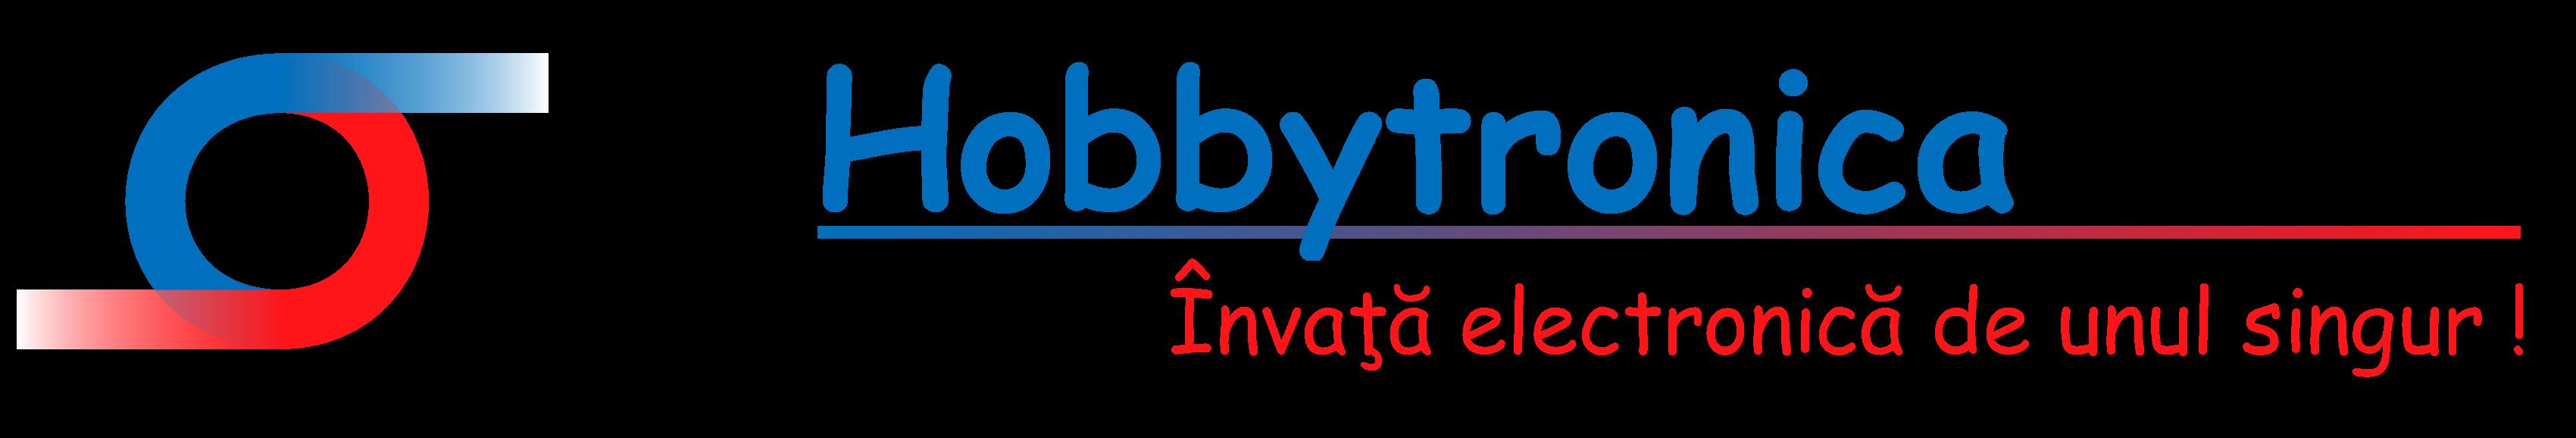 Hobbytronica